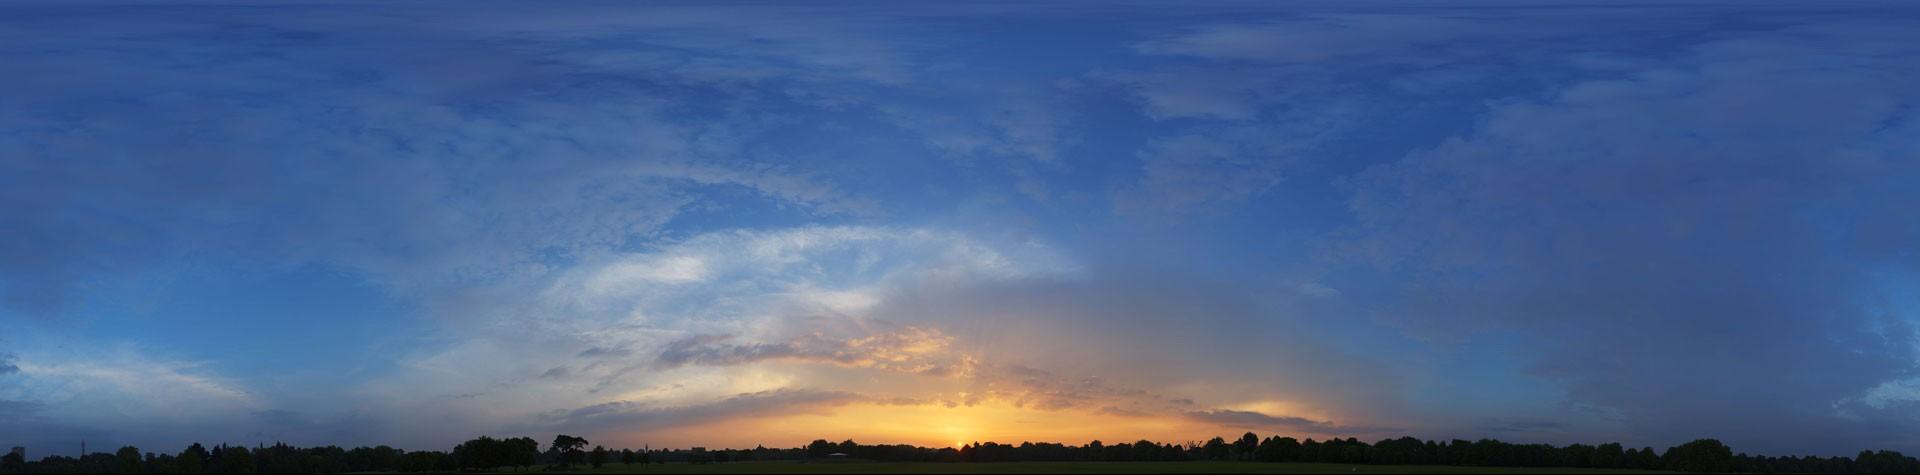 Sunset 7 (64k)